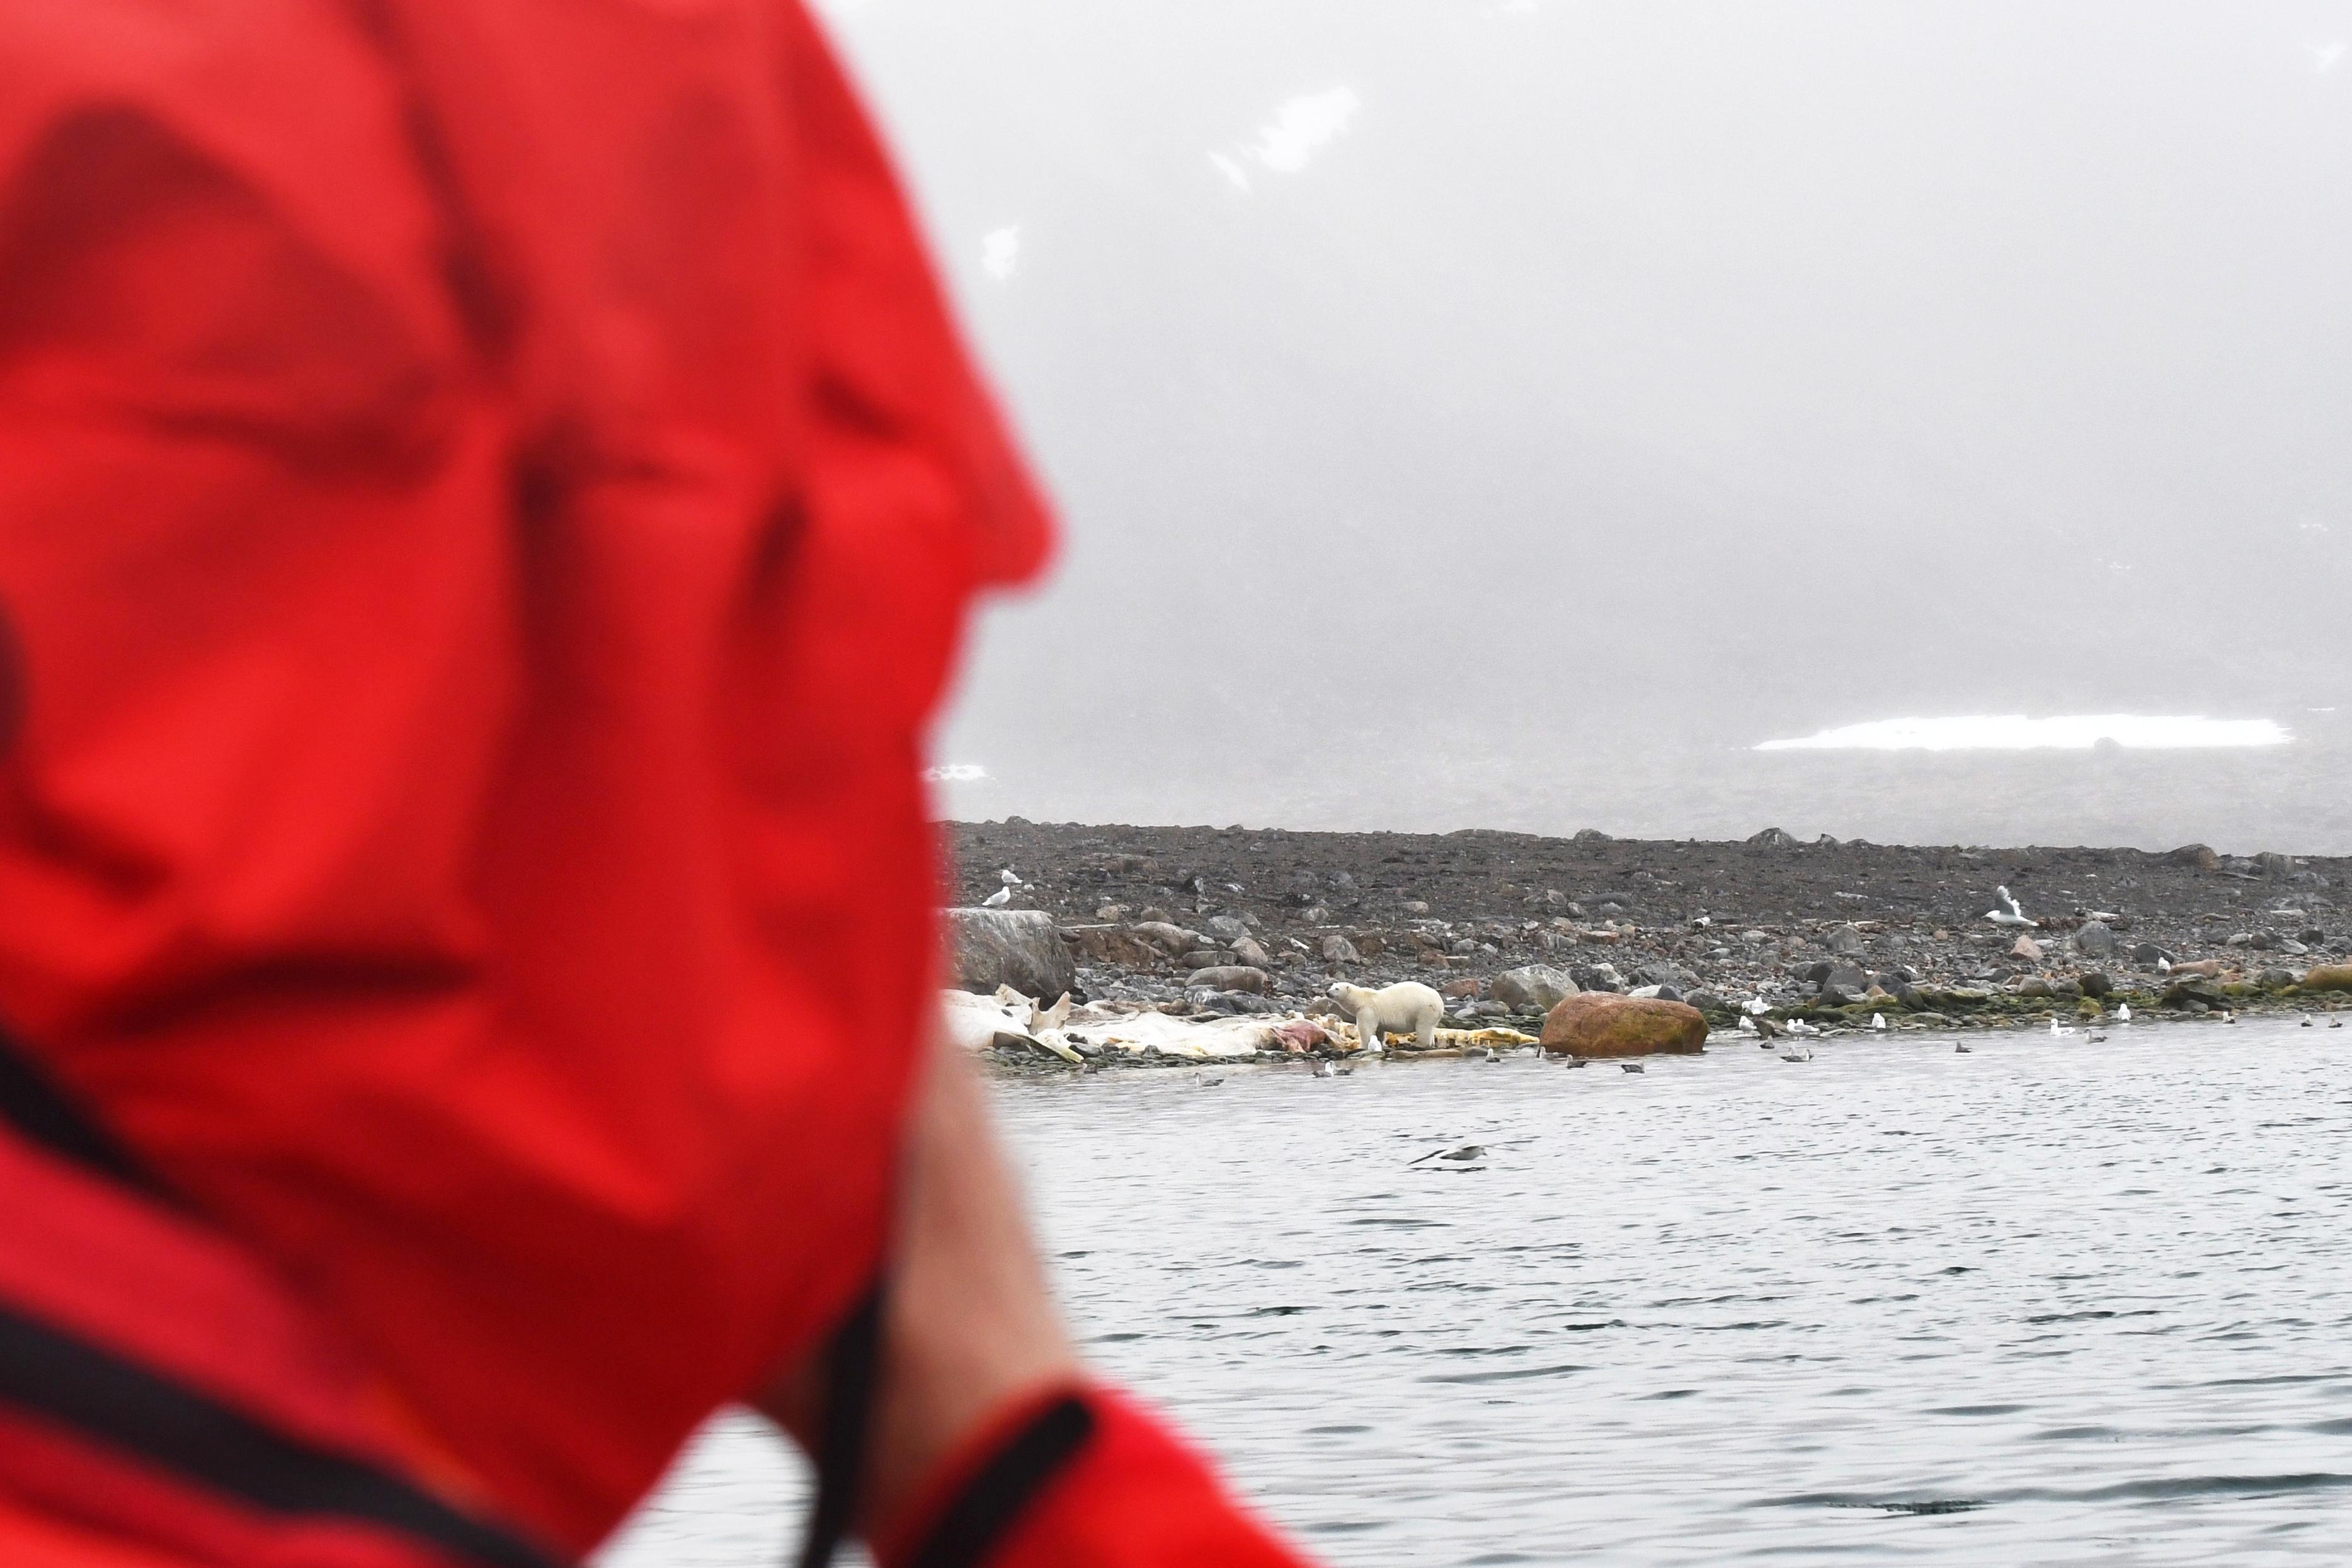 Danskoya; polar bear; sperm whale; carcas; Svalbard-aug2017-Geert_Kroes-015.jpg